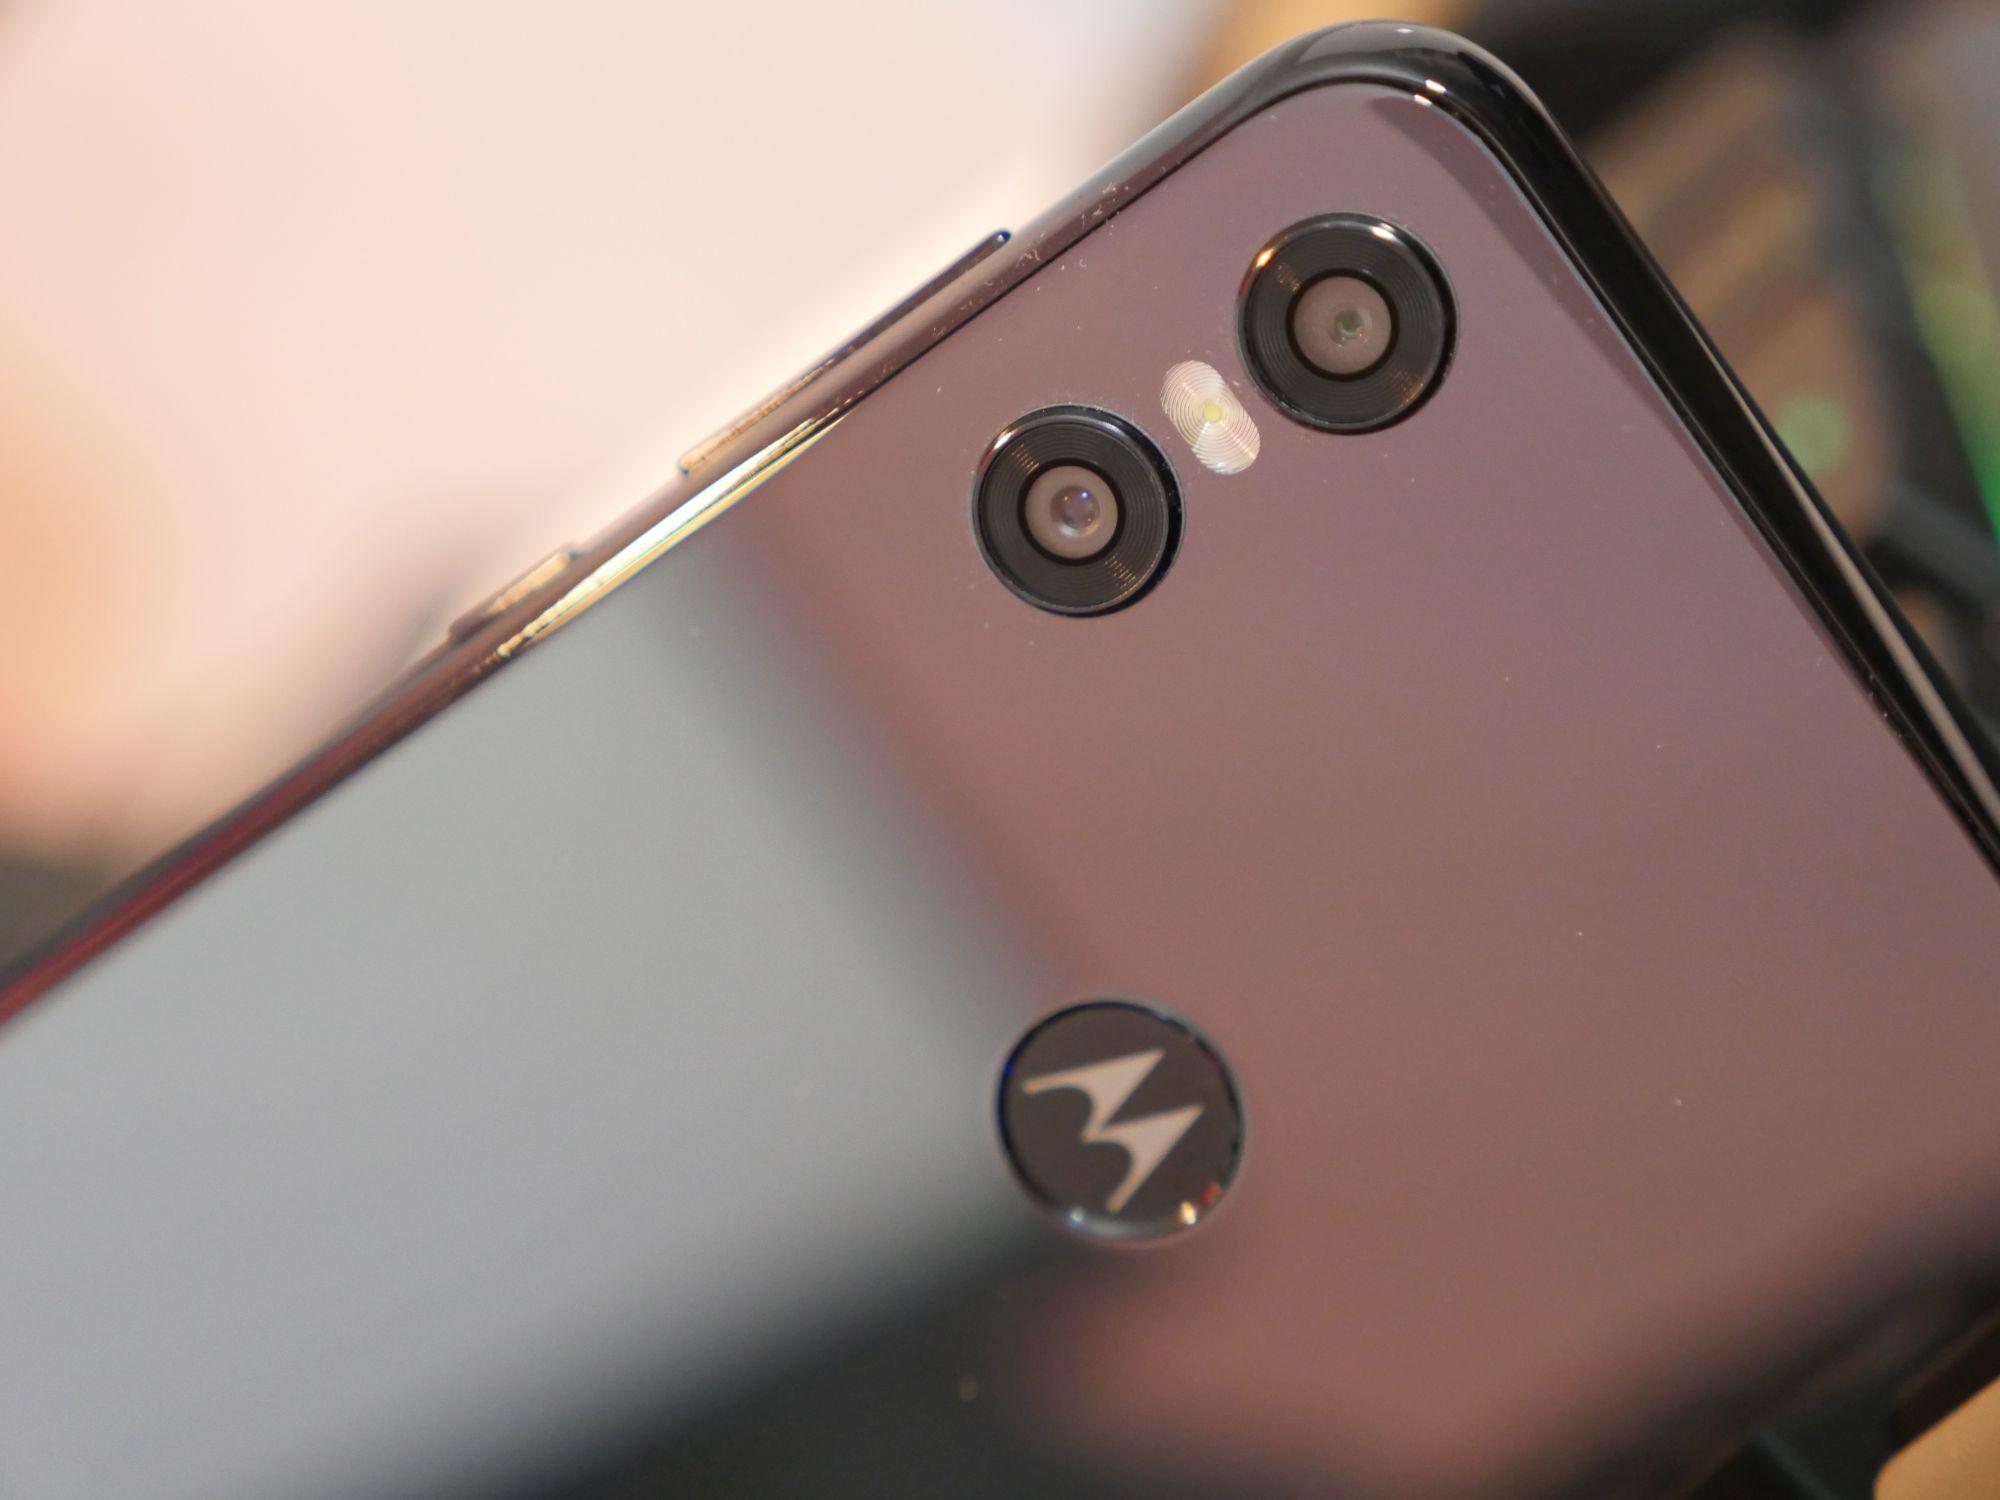 Jaki smartfon warto kupić na Komunię? 20